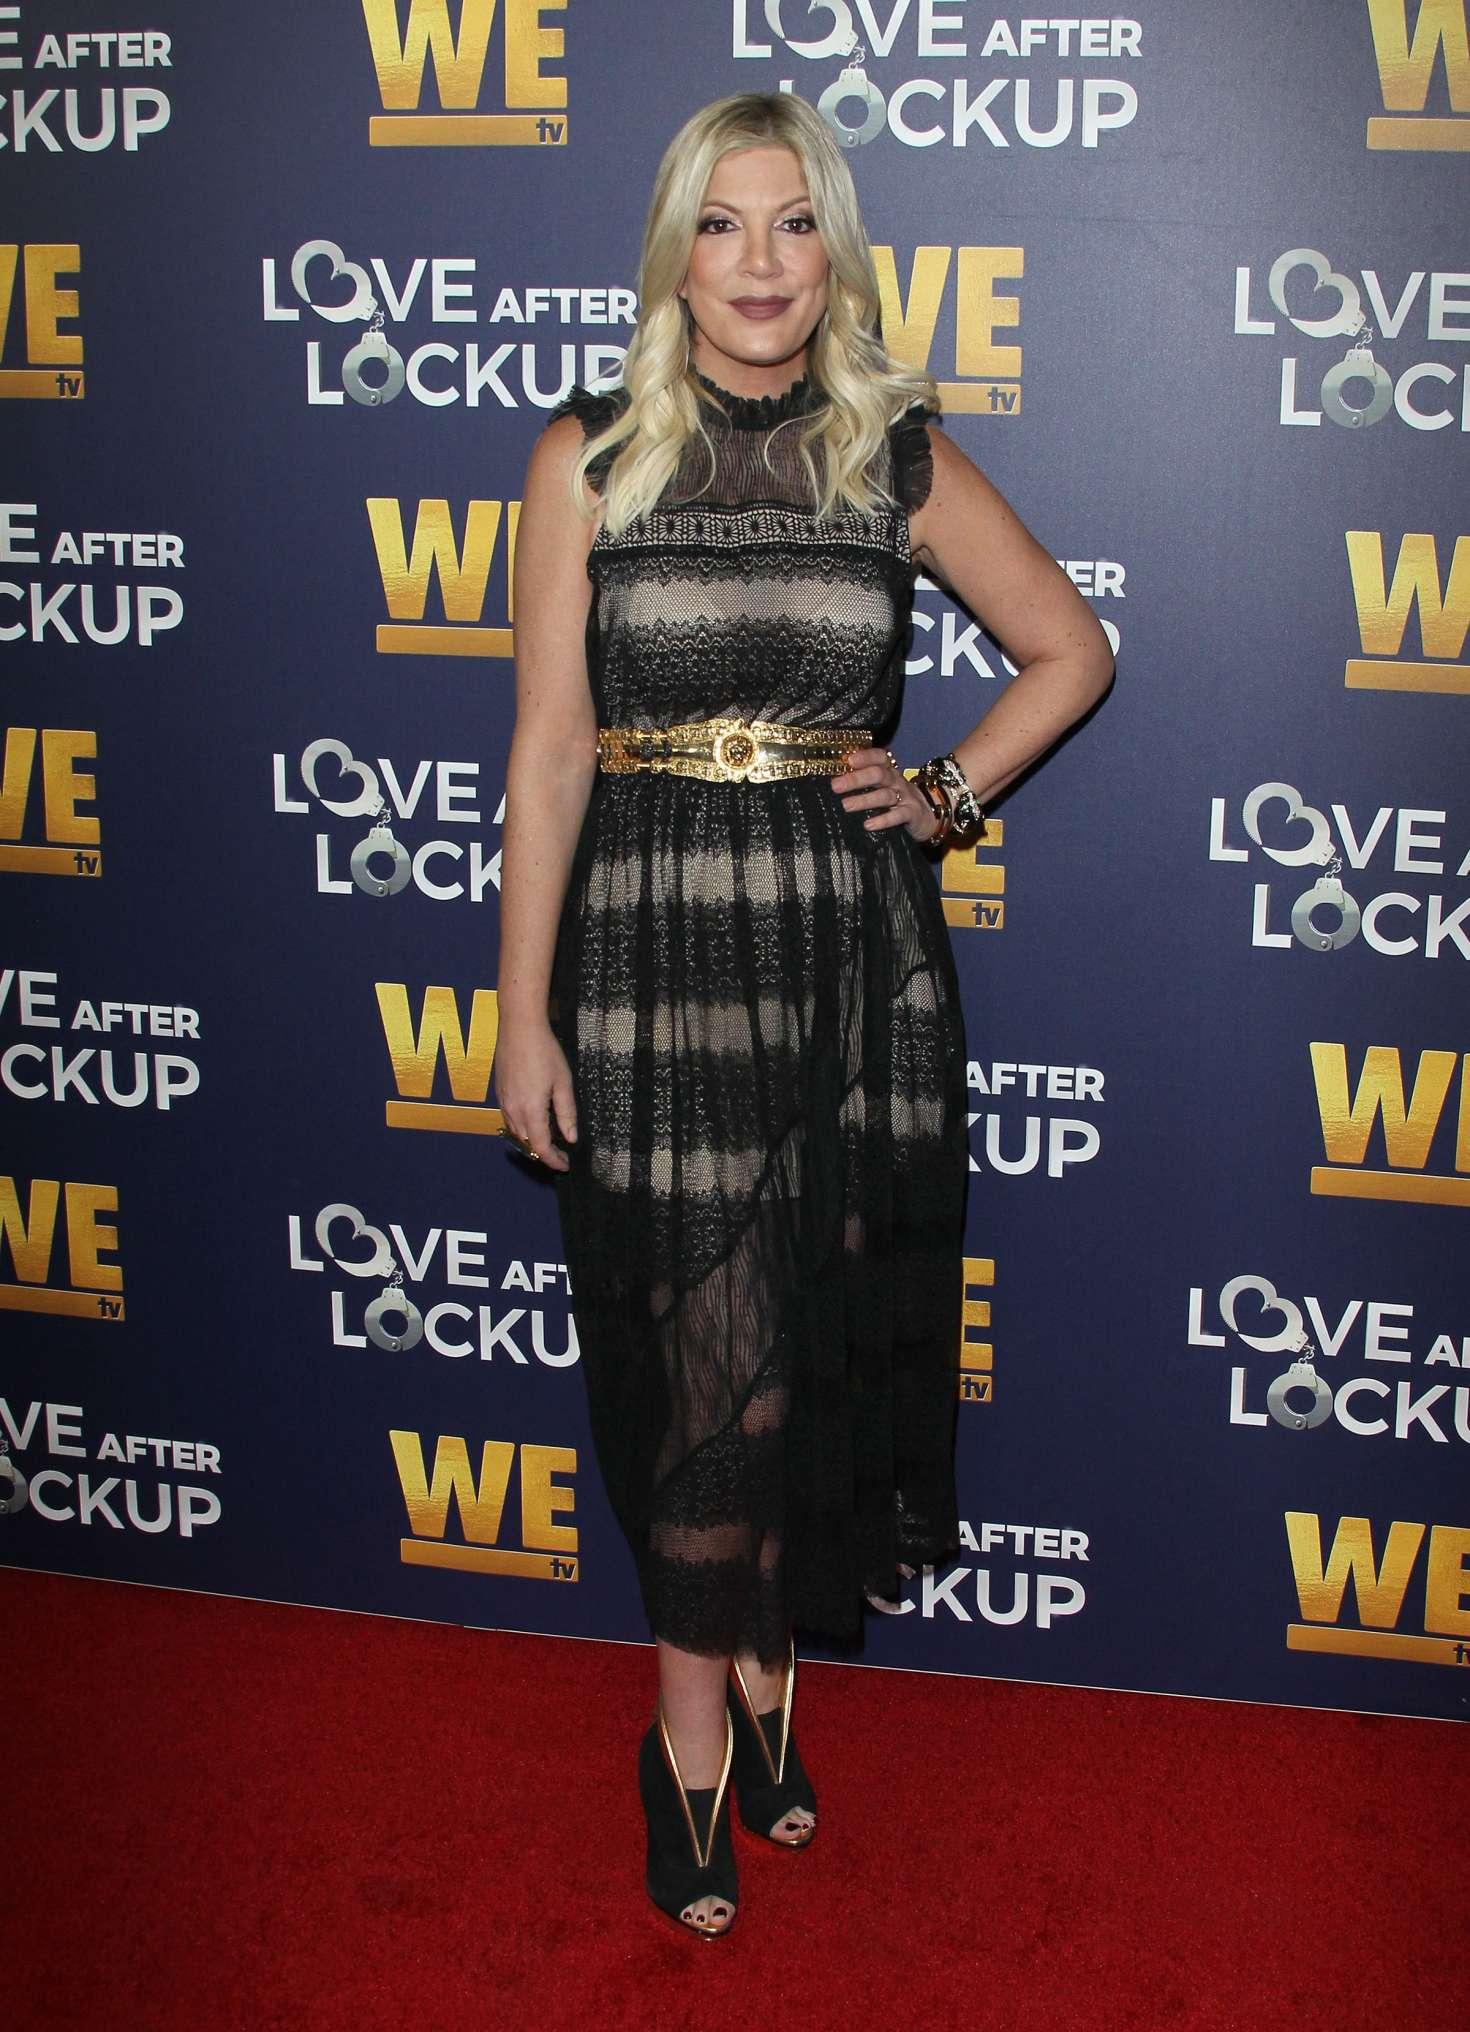 Tori Spelling 2018 : Tori Spelling: Love After Lockup Panel -08